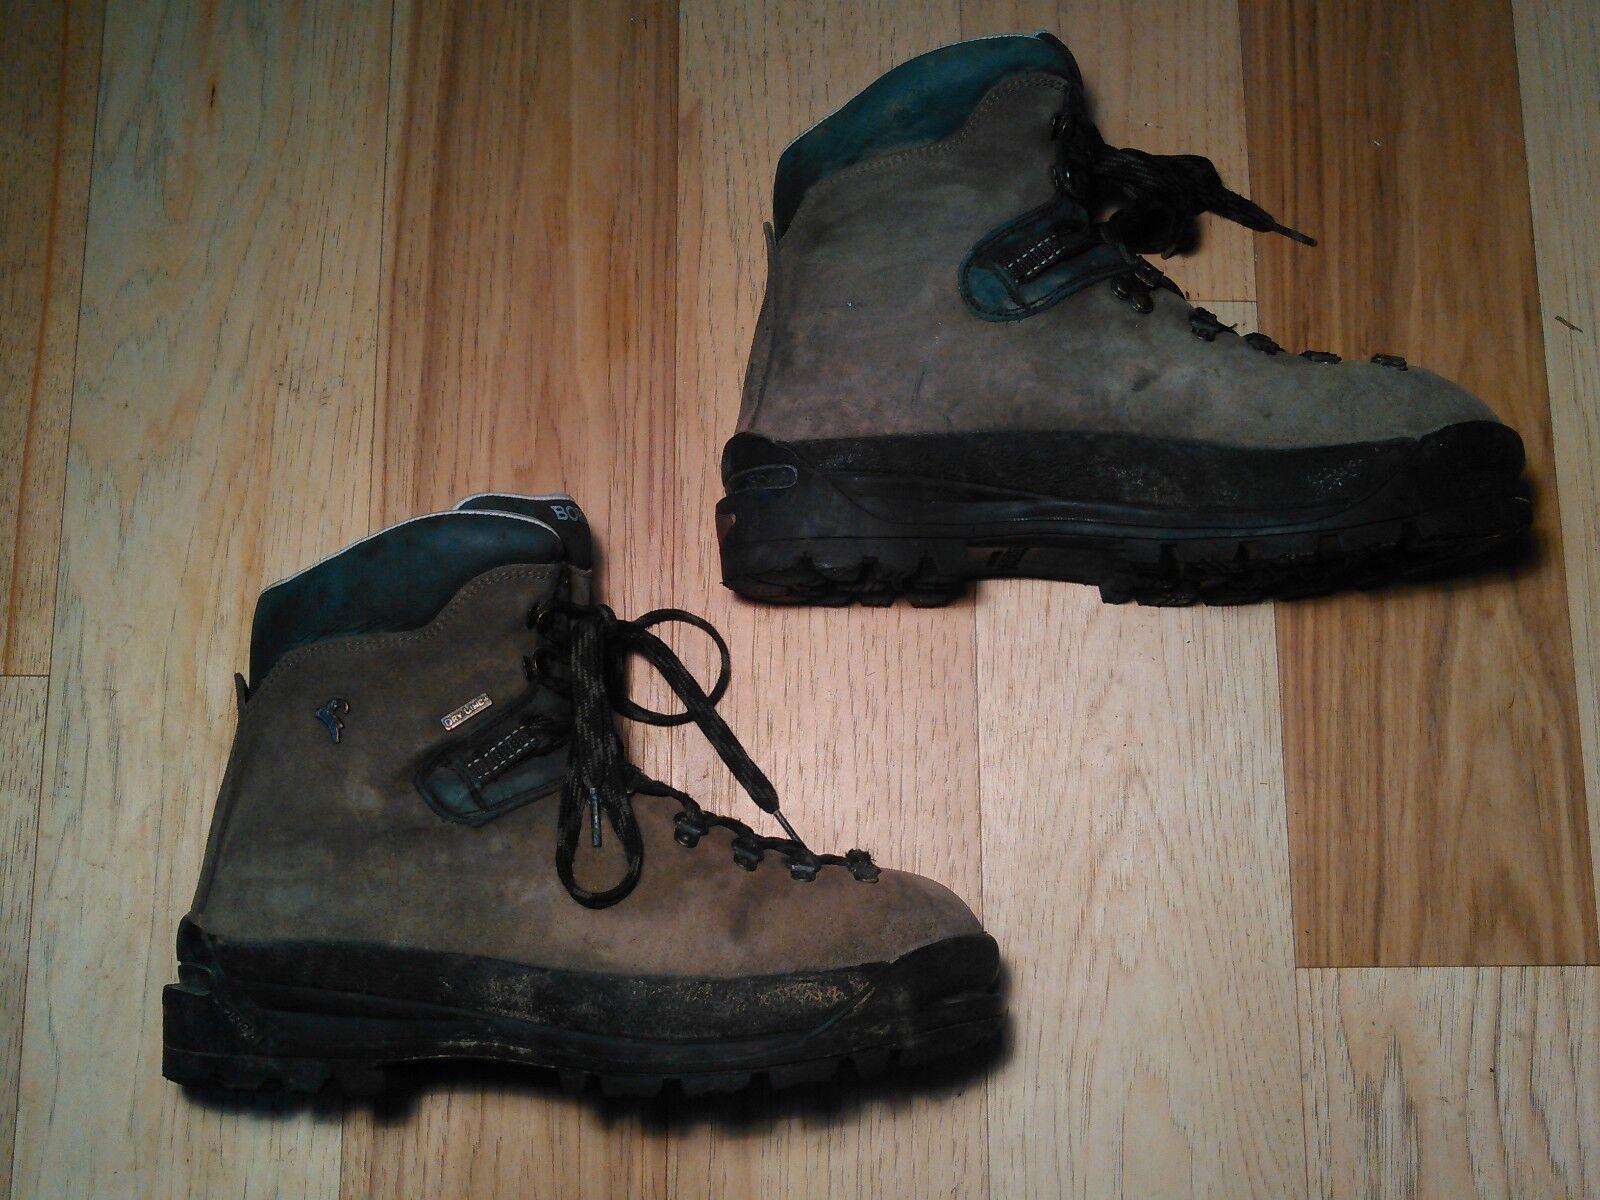 Boreal Asan Mountaineering Boot Mens 10 1 2